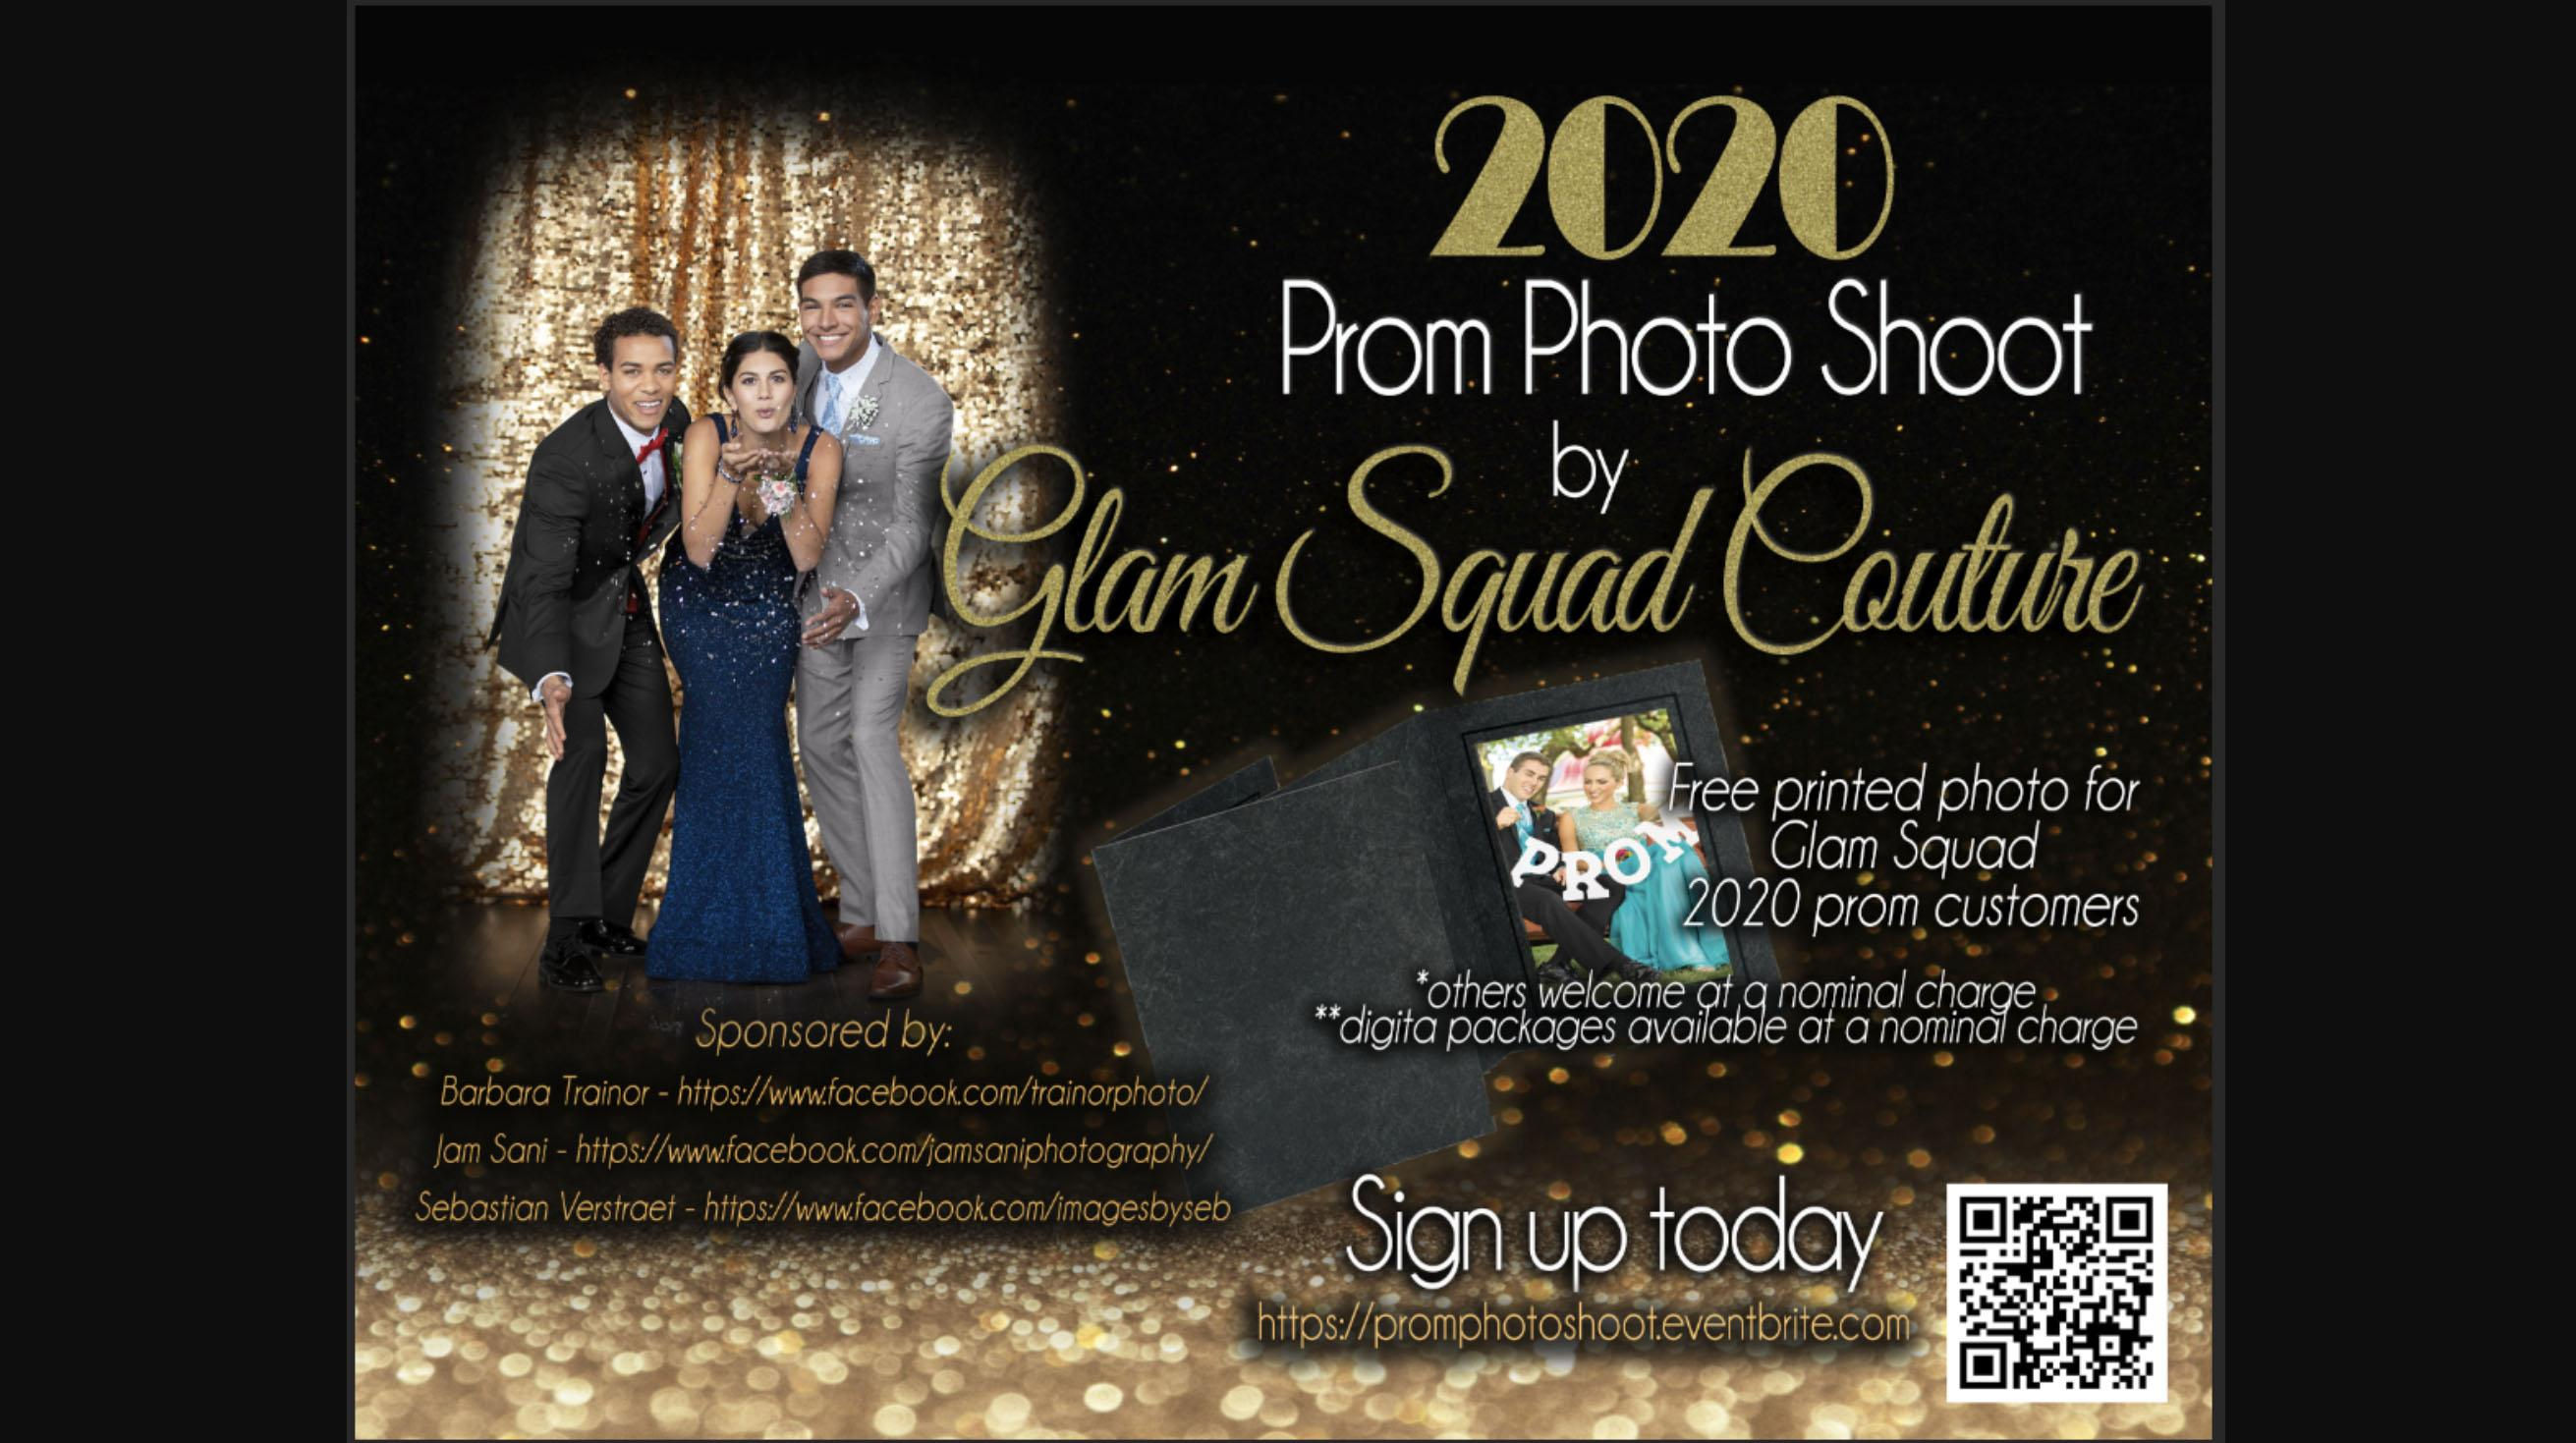 PROM 2020 PHOTO SHOOT